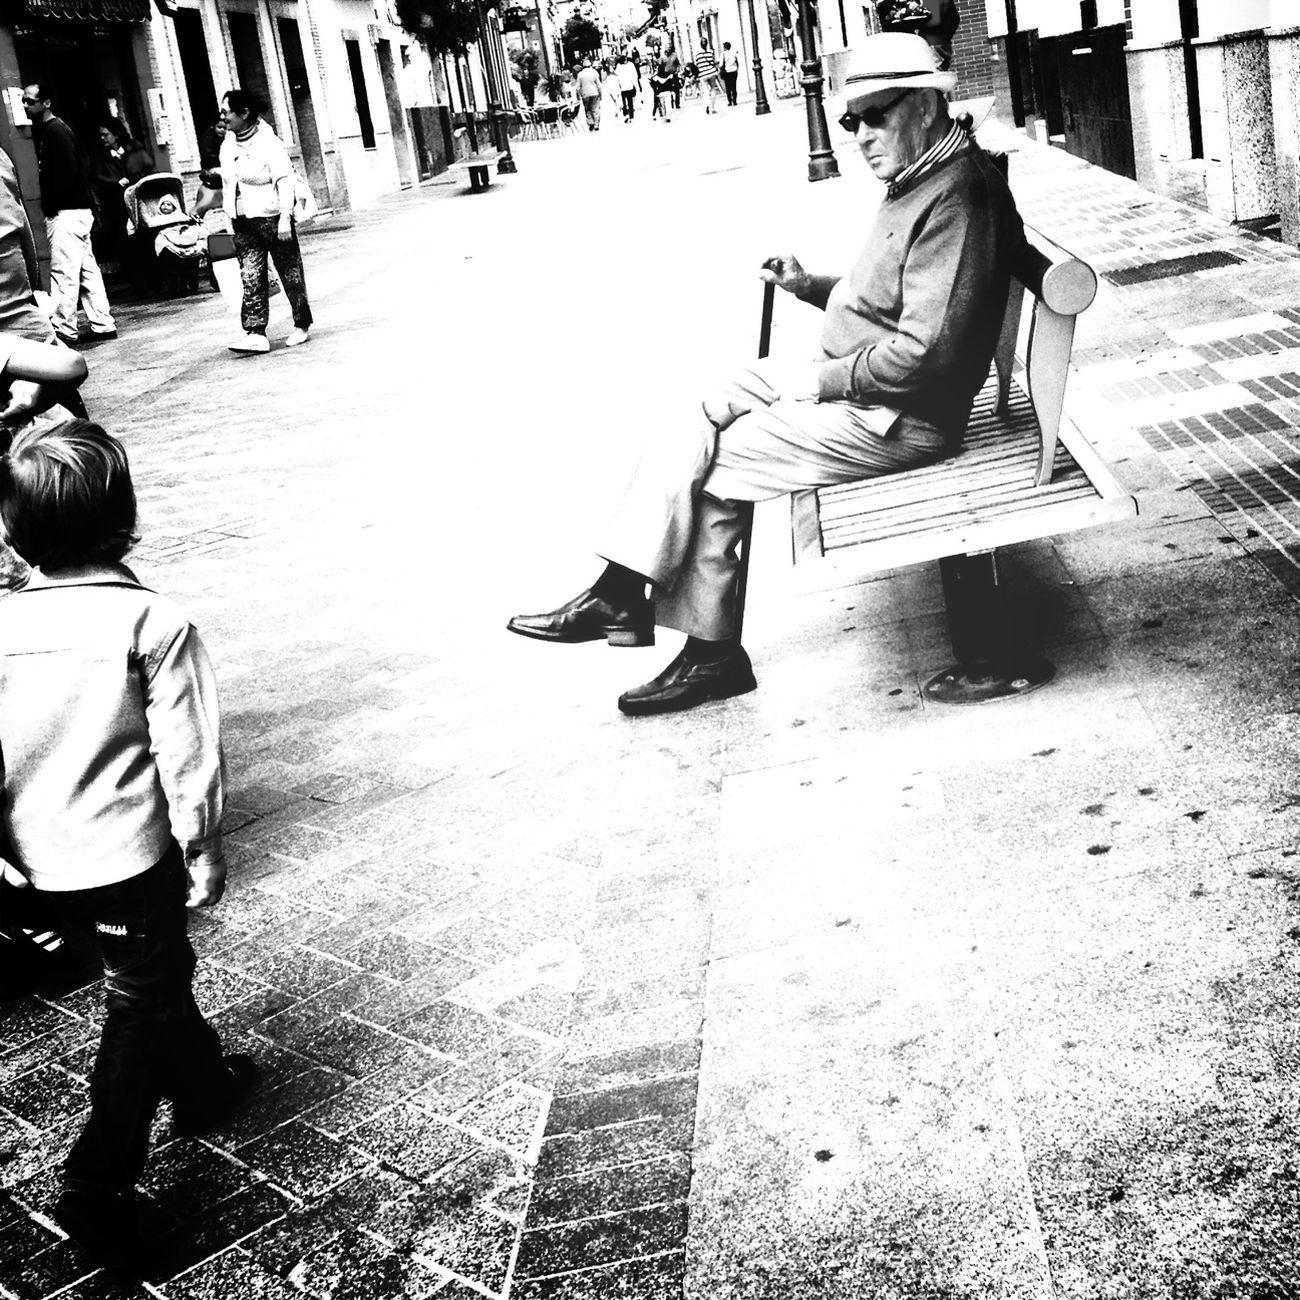 Blackandwhite Streetphoto_bw Bw_collection EyeEm Best Shots